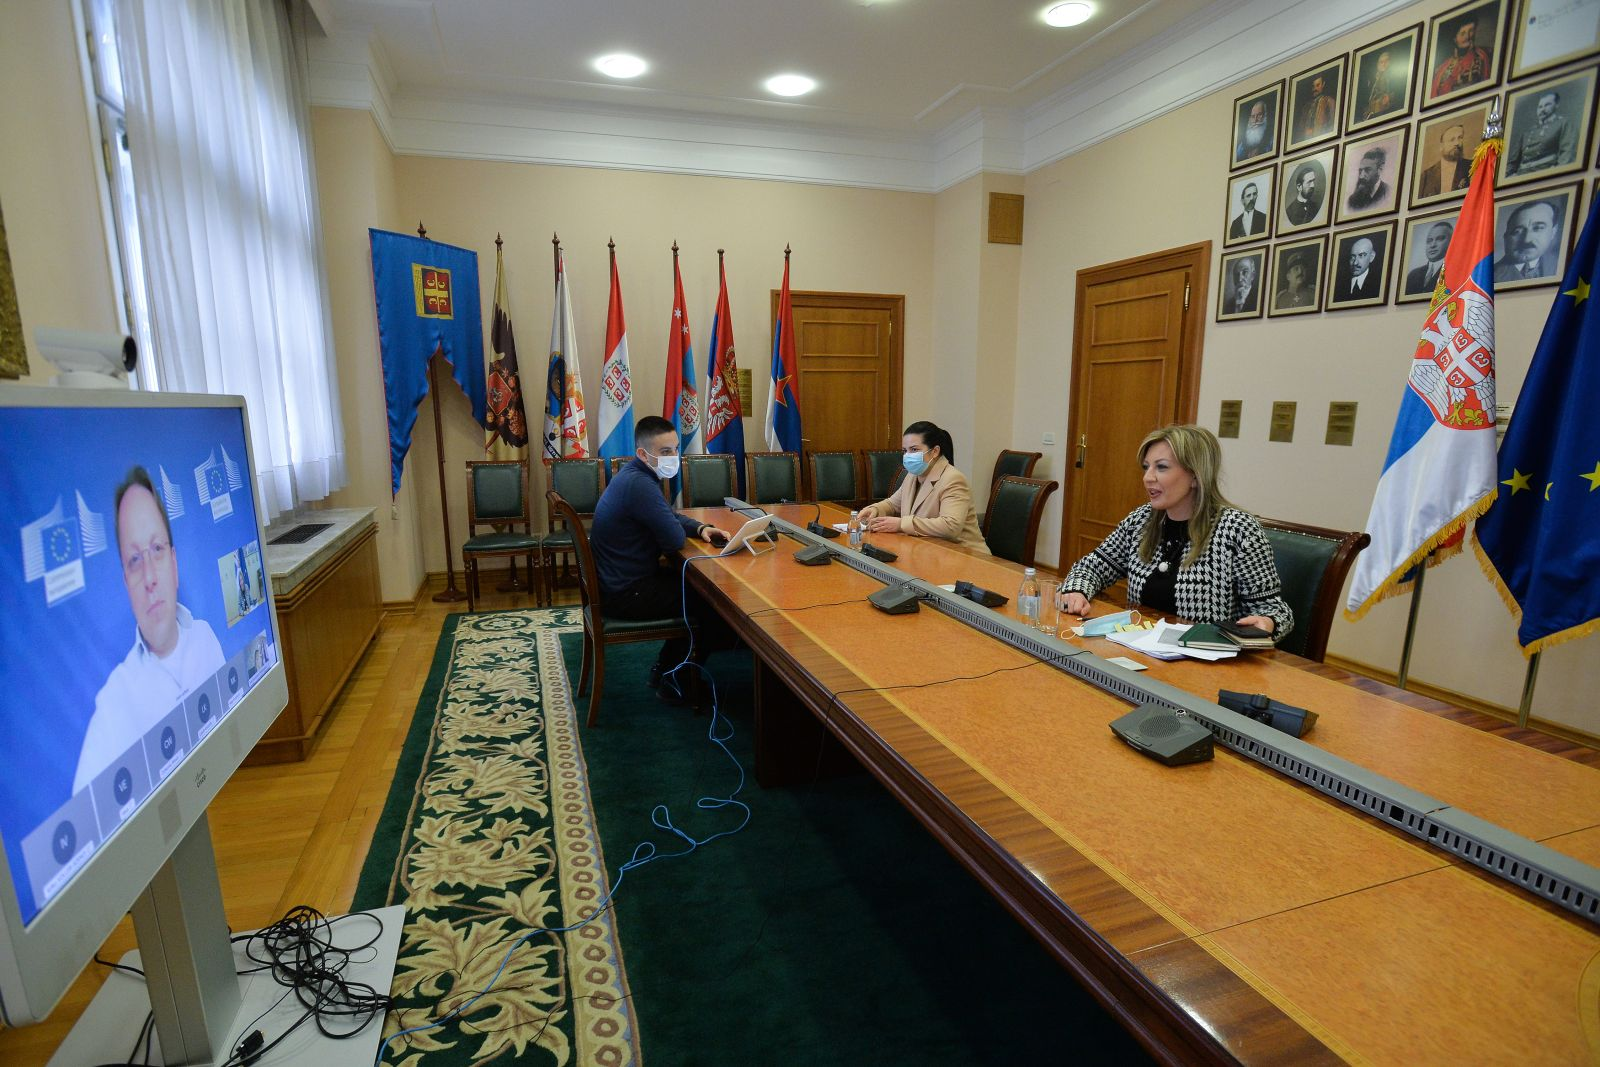 Ј. Јоксимовић и Вархеји: Нова методологија за већи кредибилитет преговора